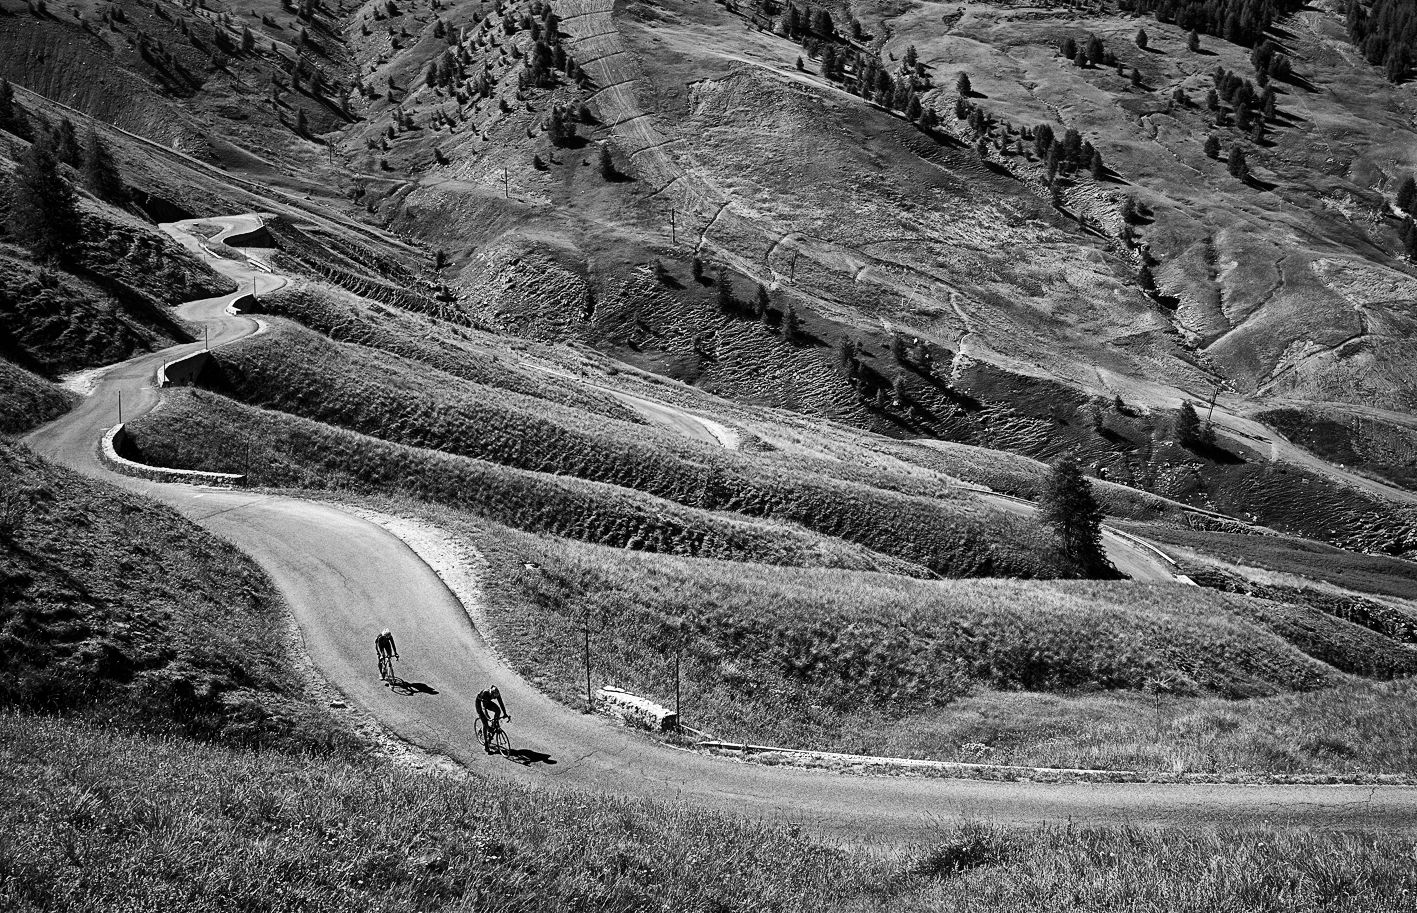 Cycliste Col Allos AOut 2020 copie